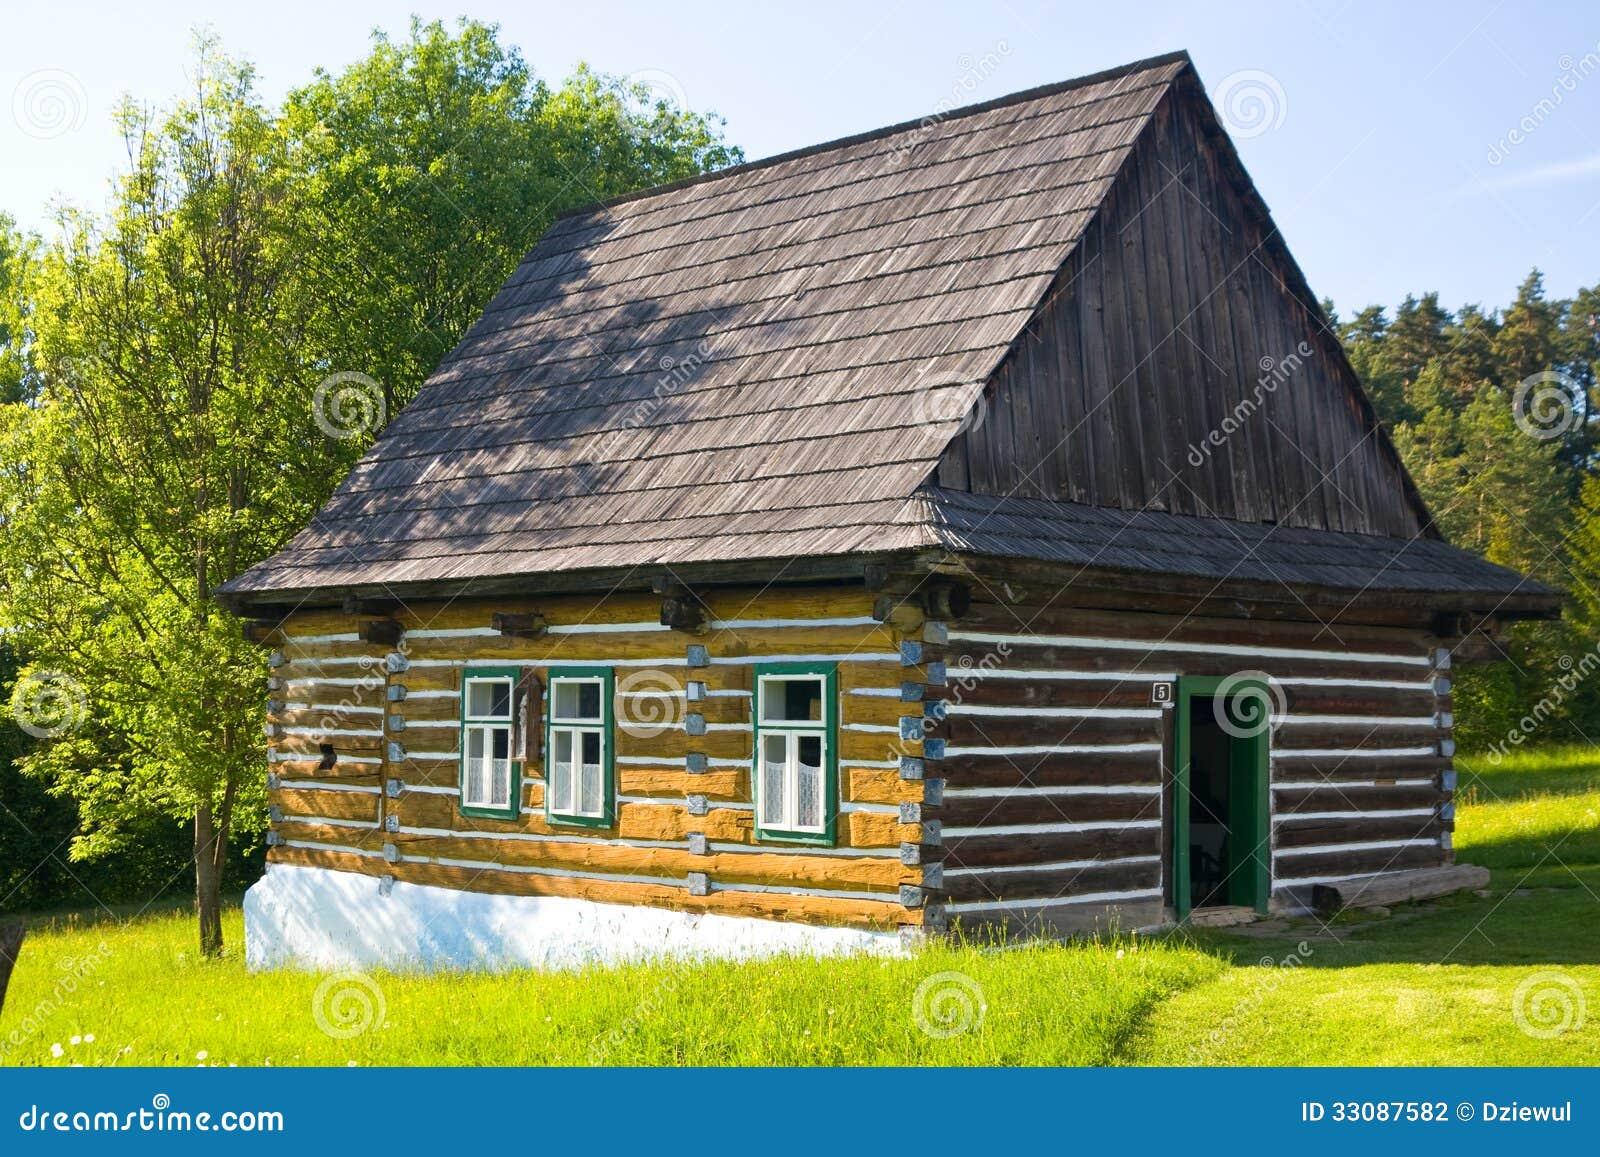 Open air folk museum, Slovakia